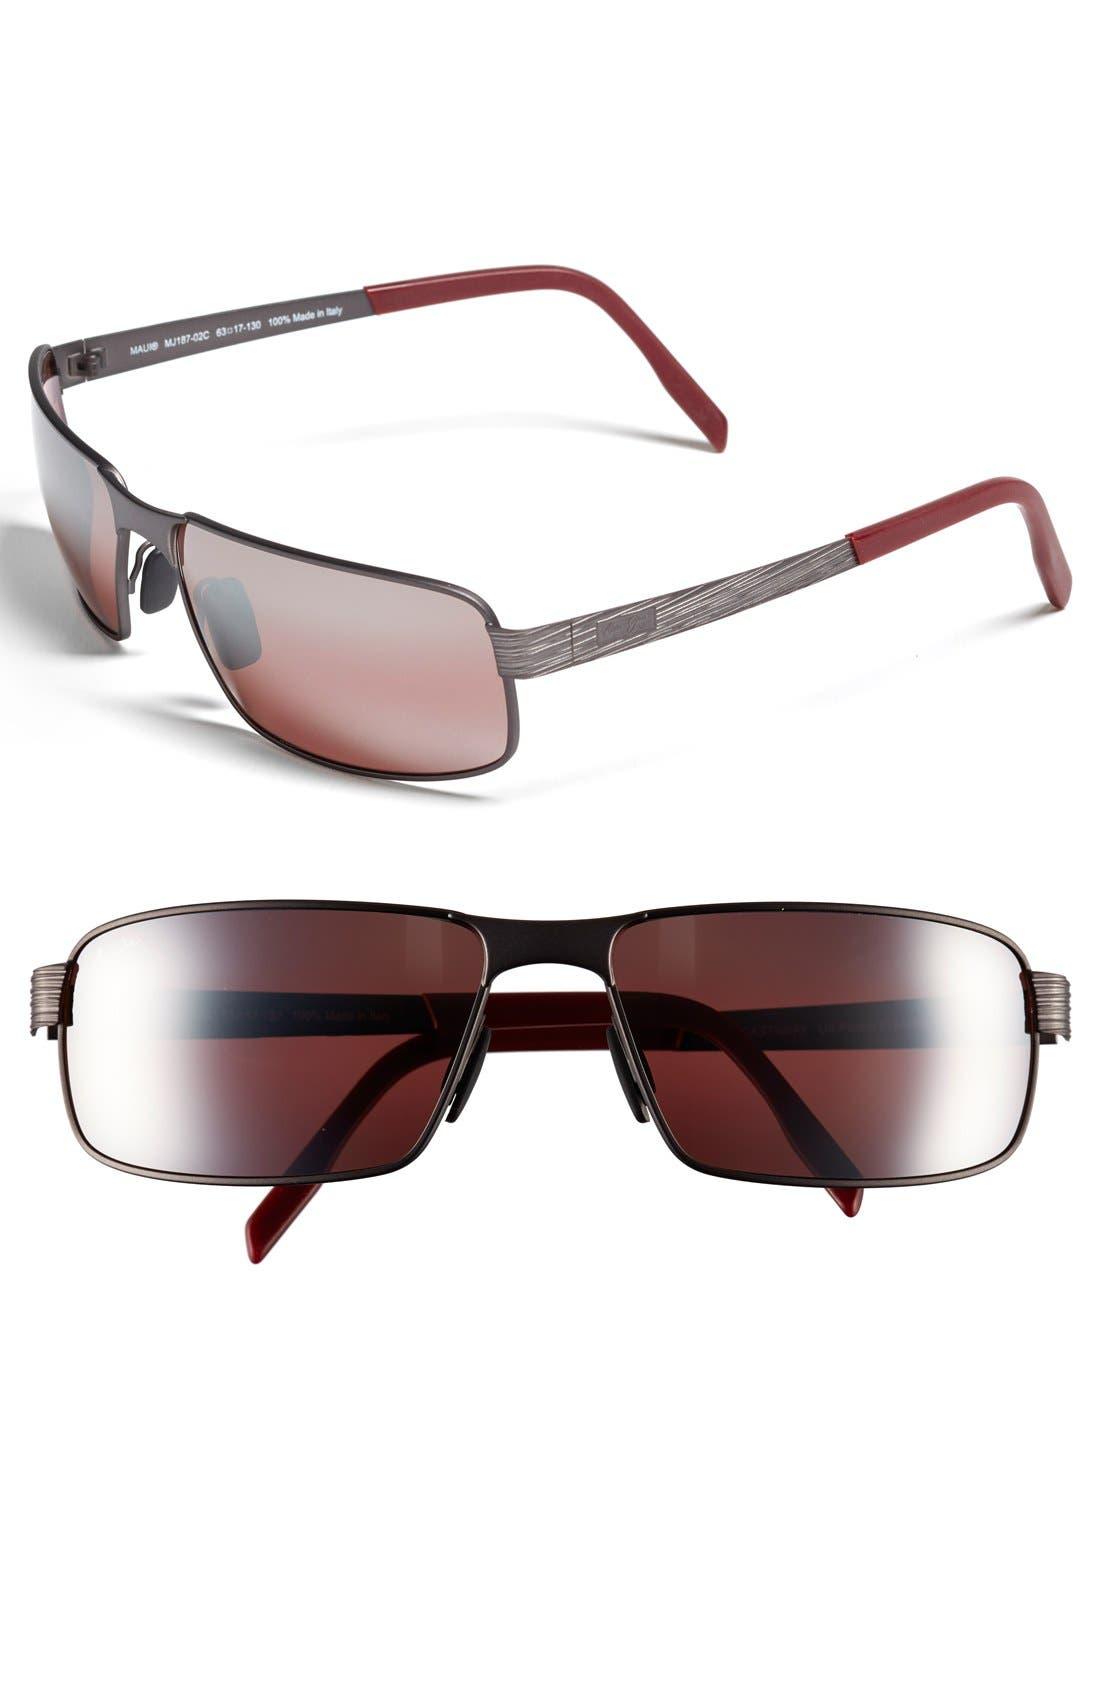 615050a30a Maui Jim  Castaway - Polarizedplus2  6m Polarized Sunglasses - Dark Gunmetal